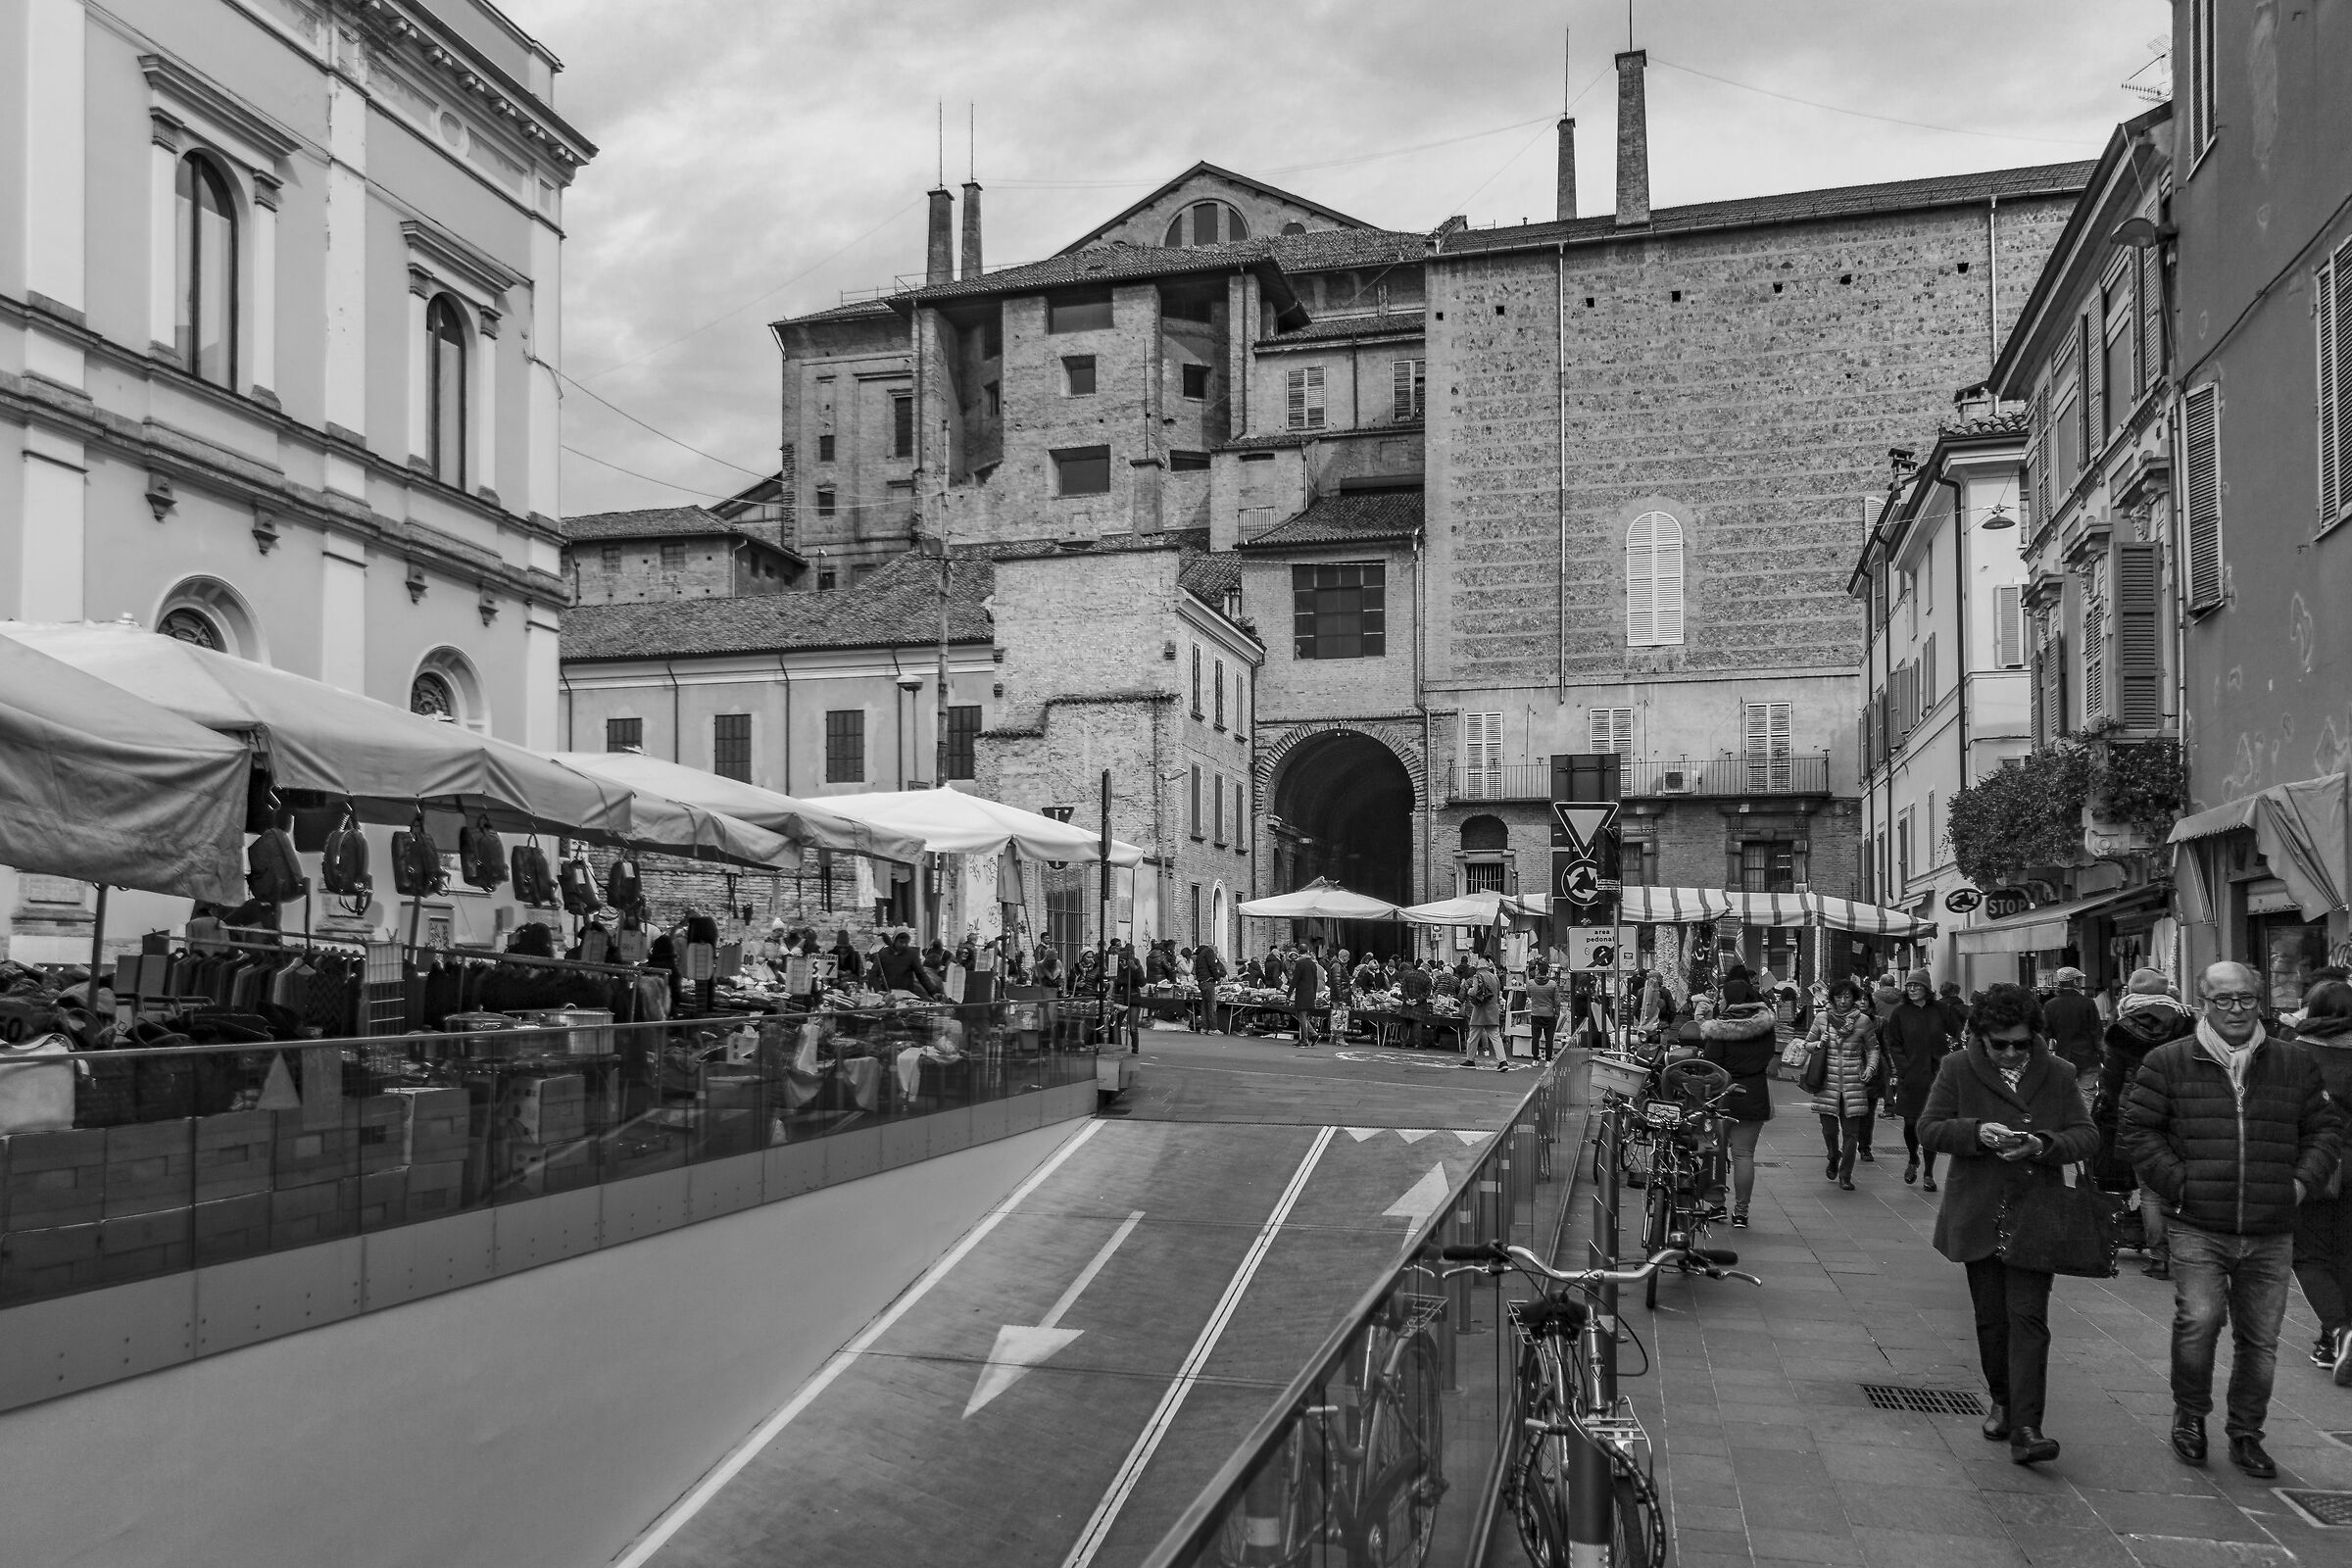 The Pilotta as seen from Piazza Ghiaia...